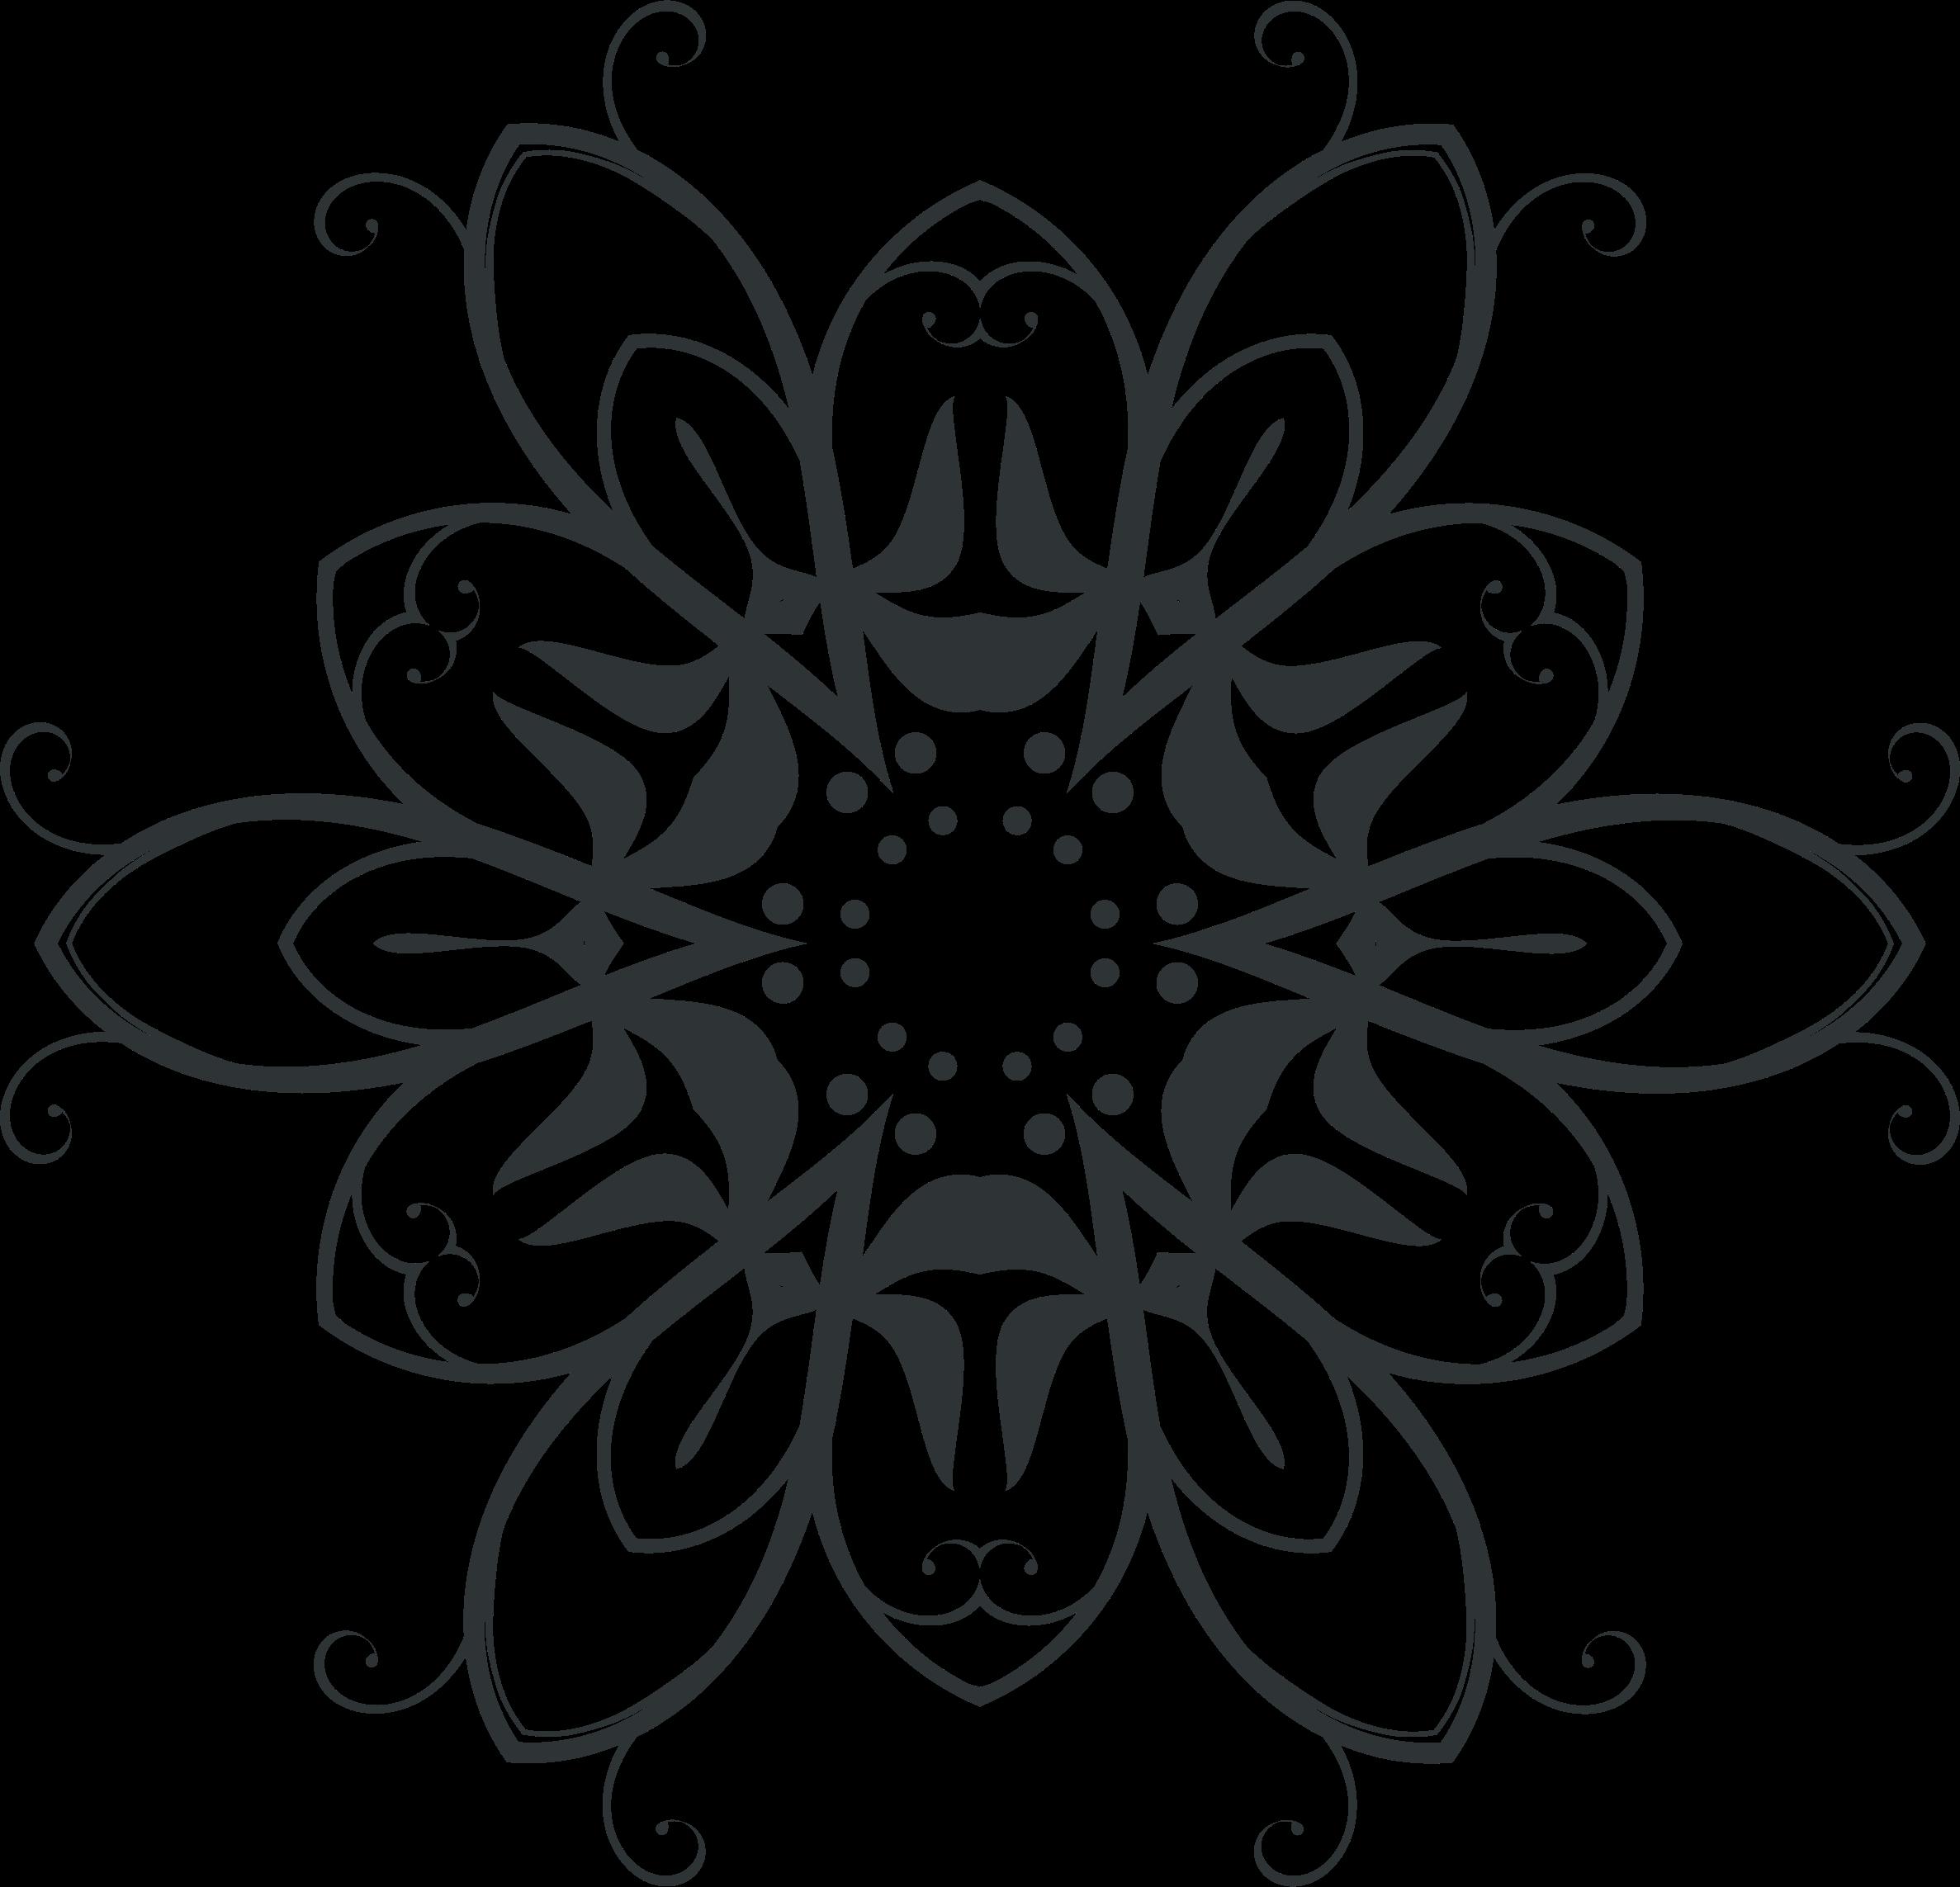 Lace clipart mehandi design. Silhouette flourish by gdj